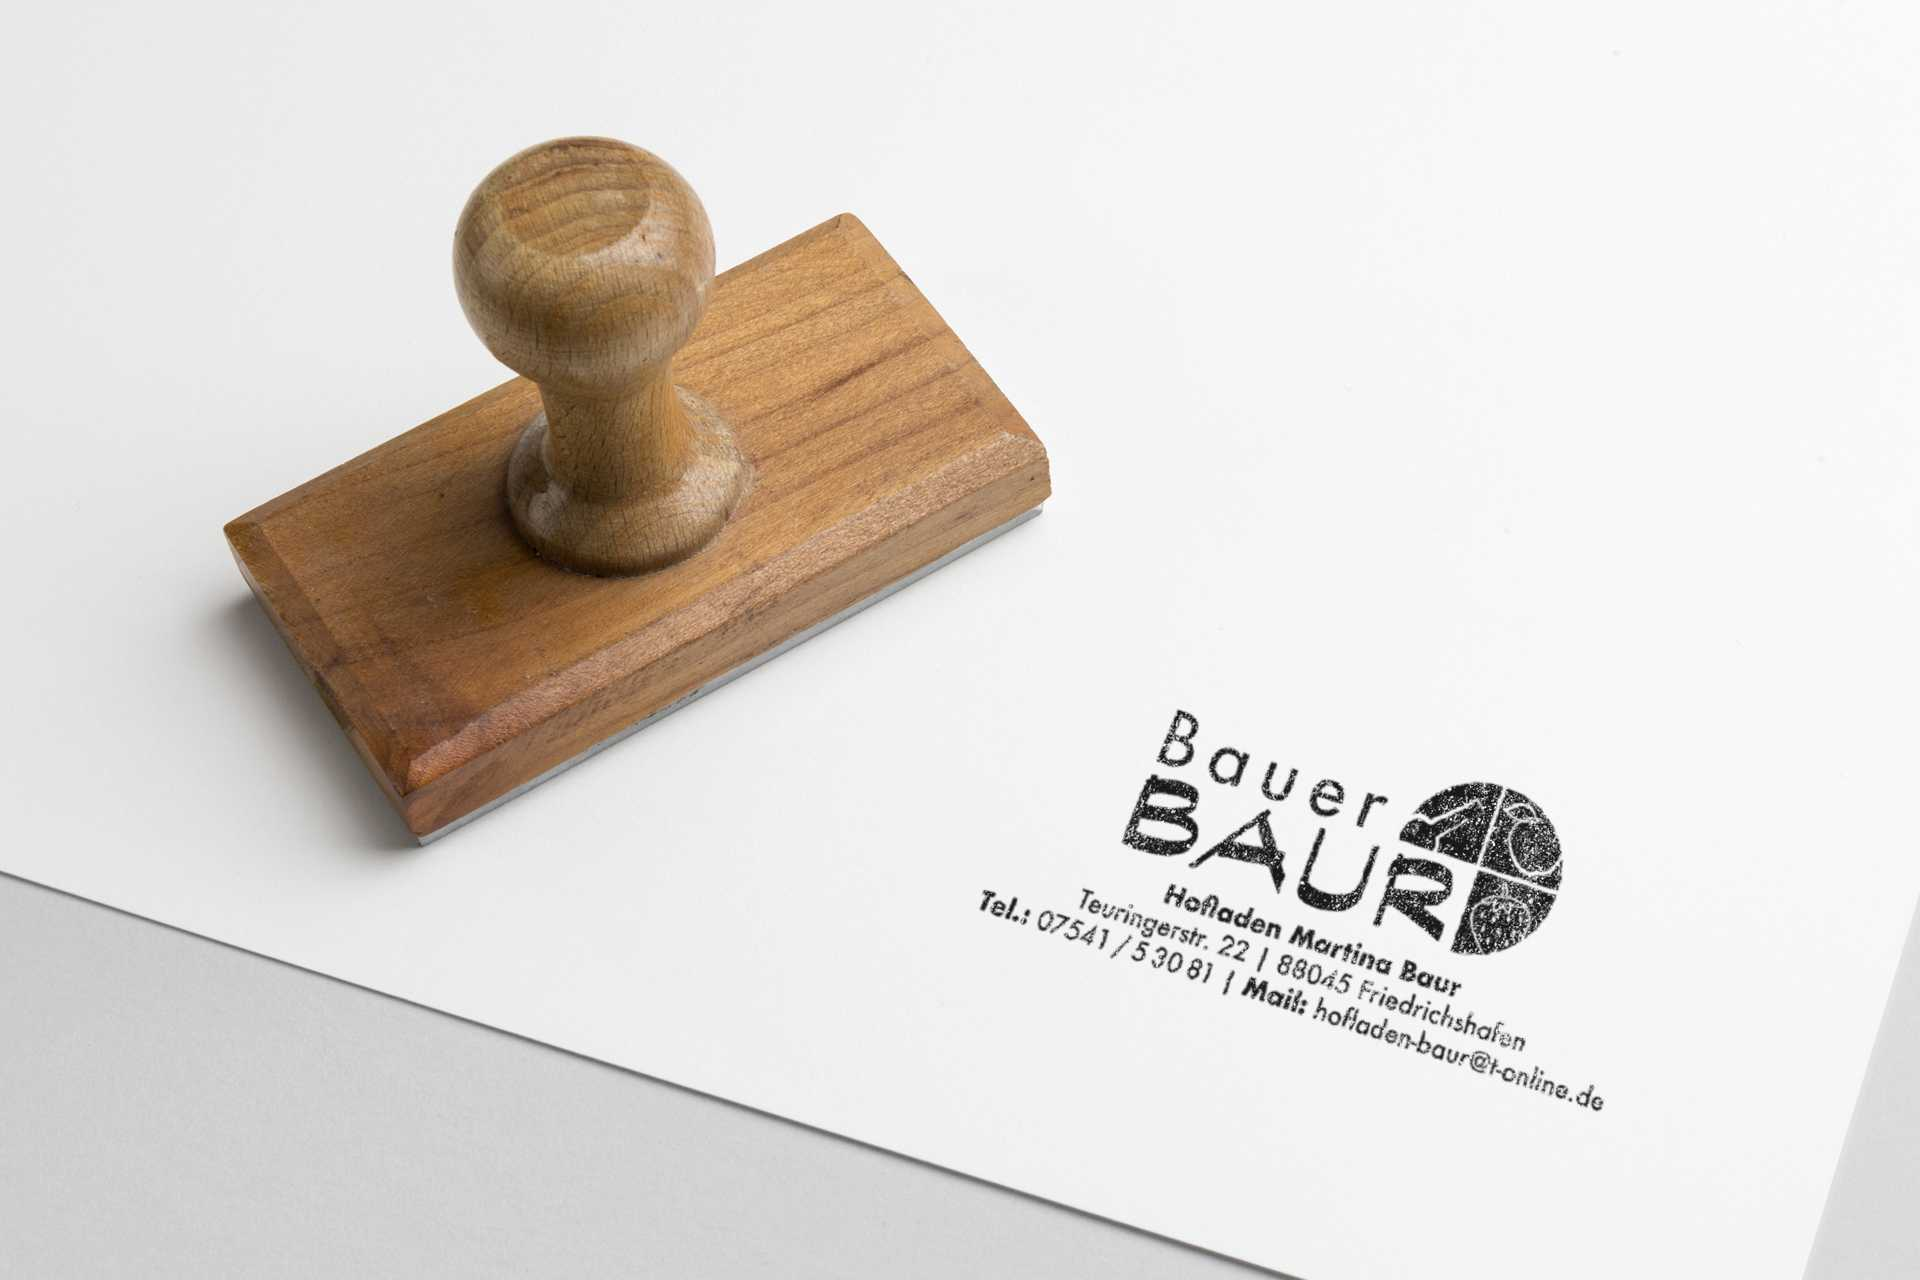 Stempel_Baur_Ref_Gestaltung